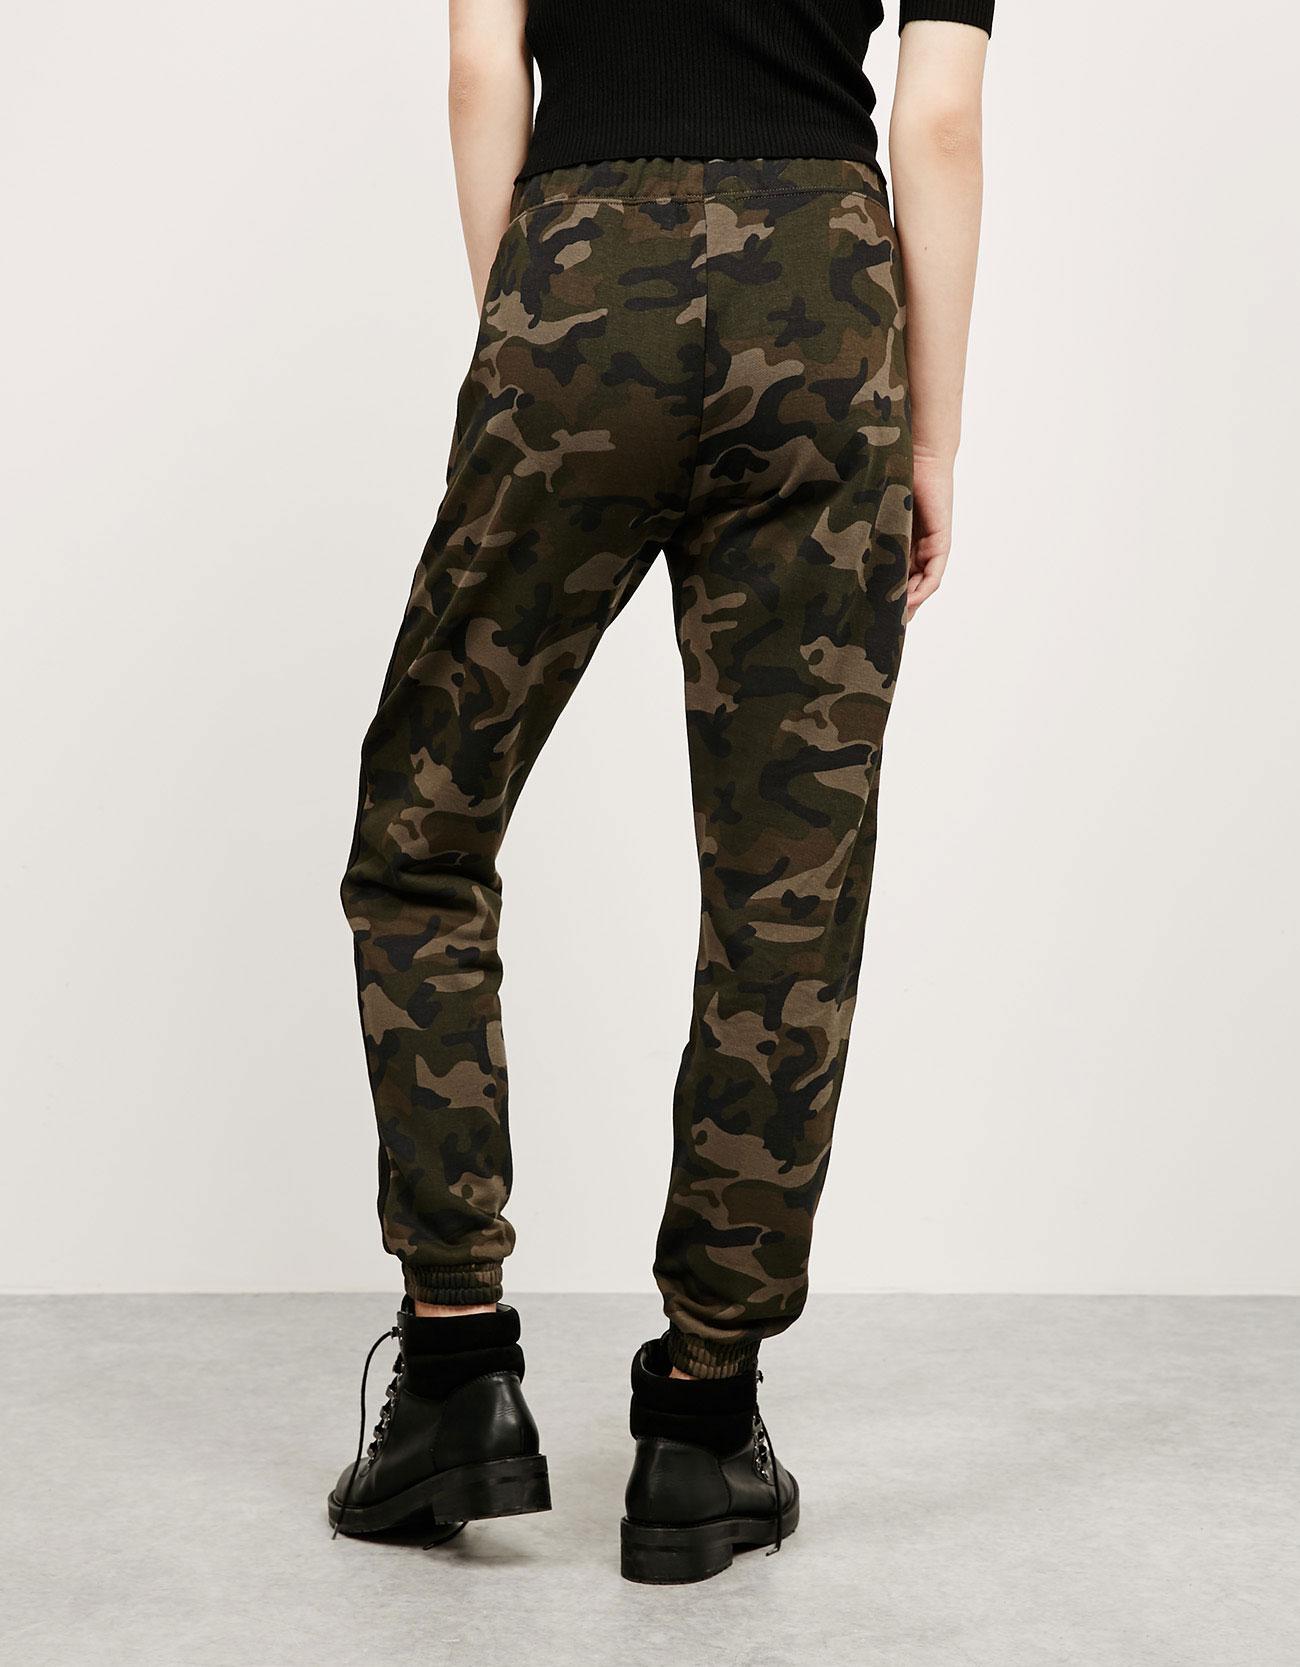 8d8a98875 pantalones camuflaje bershka